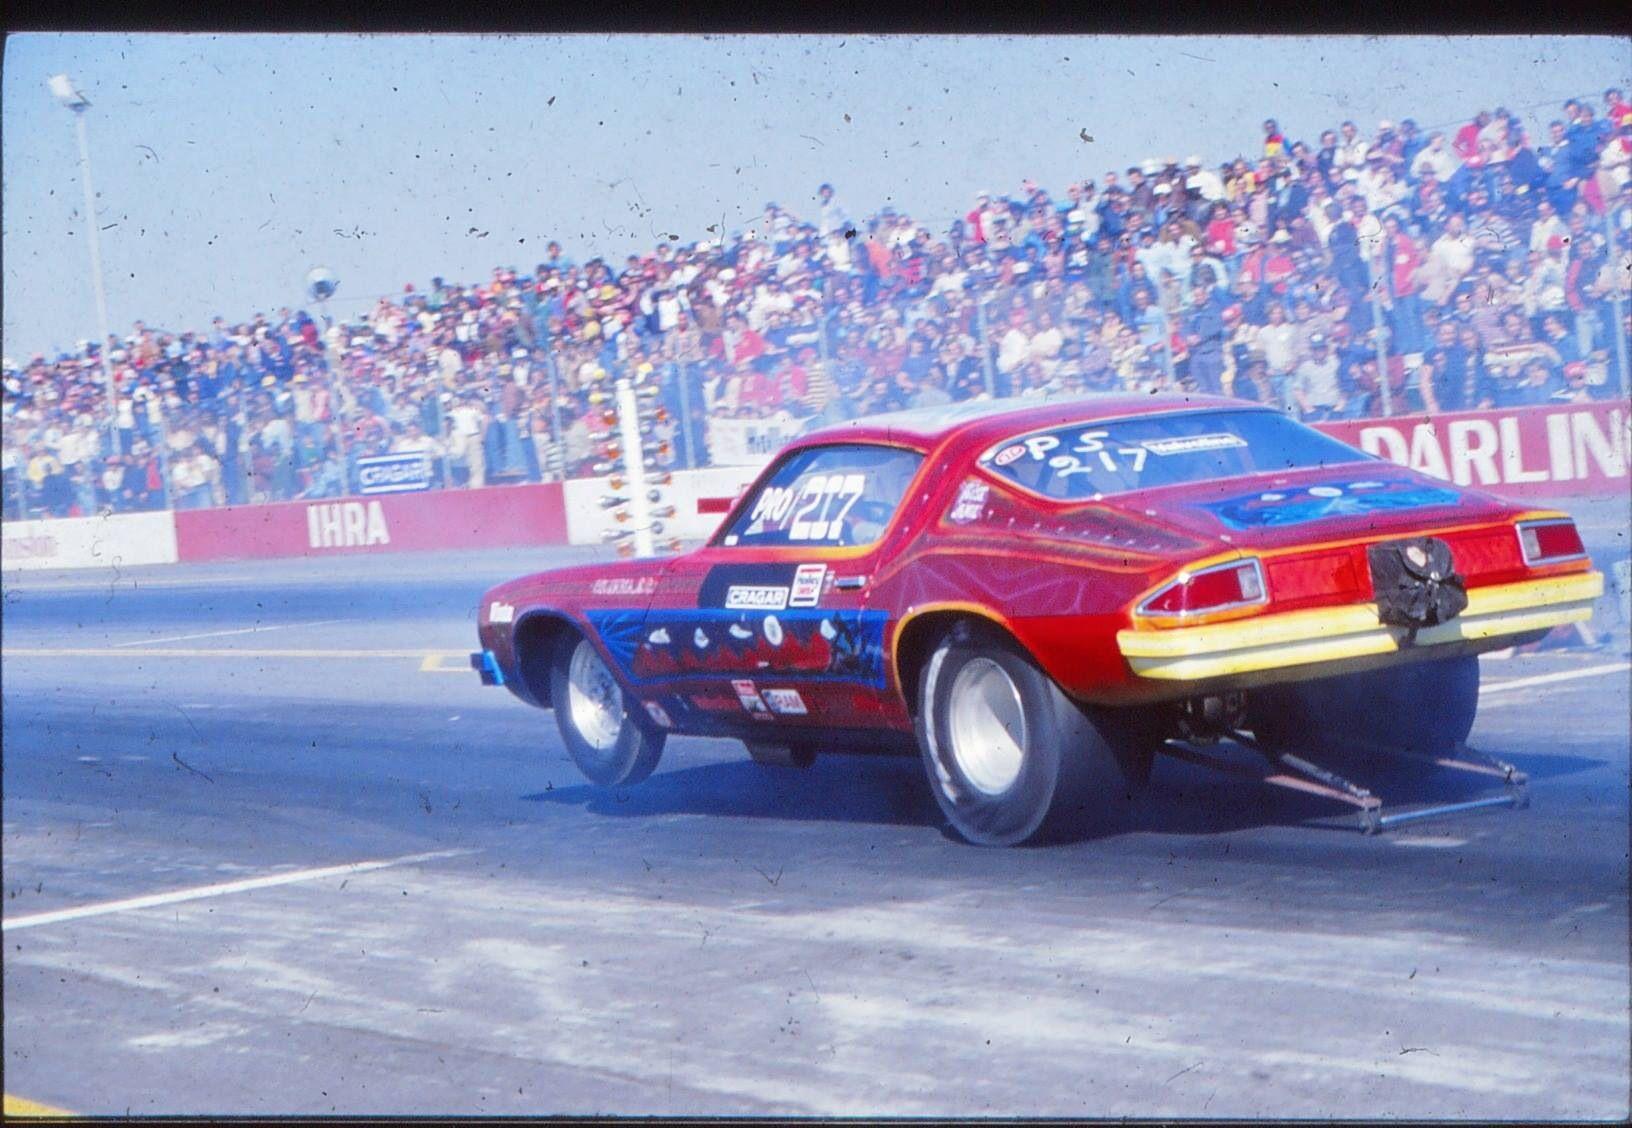 Vintage Drag Racing - Pro Stock - Camaro | Vintage Drag Racing ...